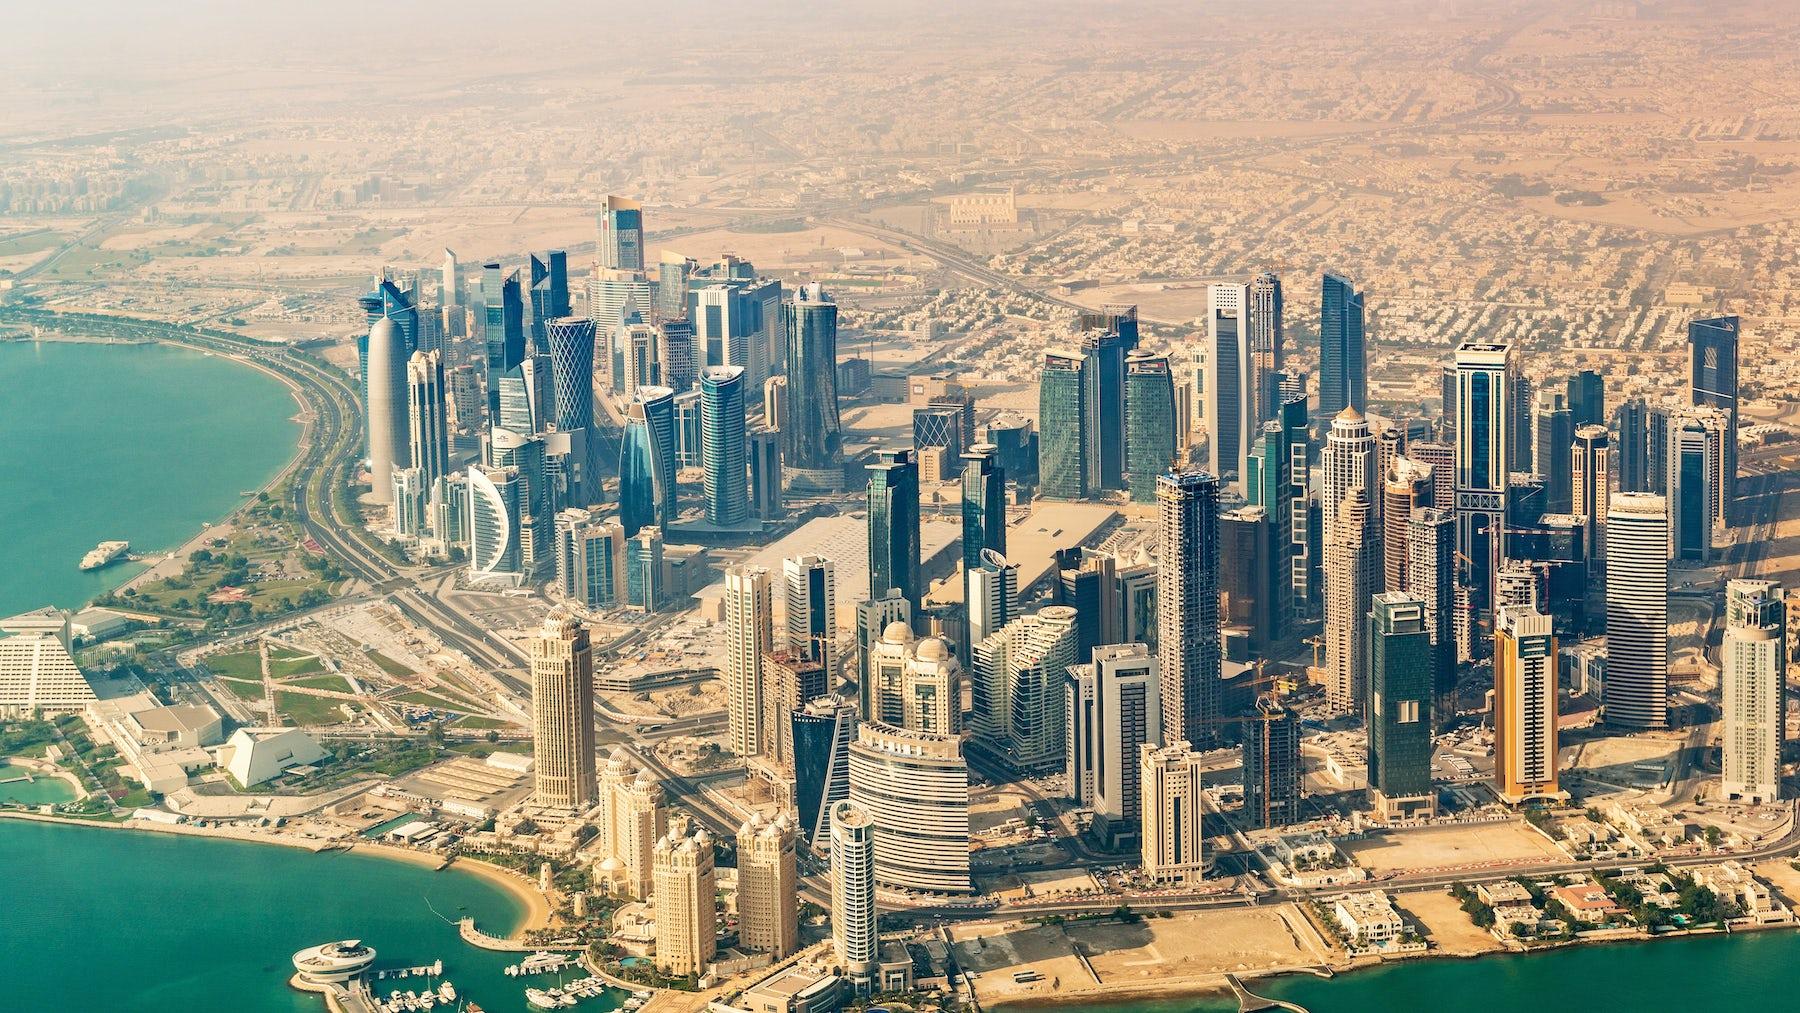 Doha, Qatar | Source: Shutterstock